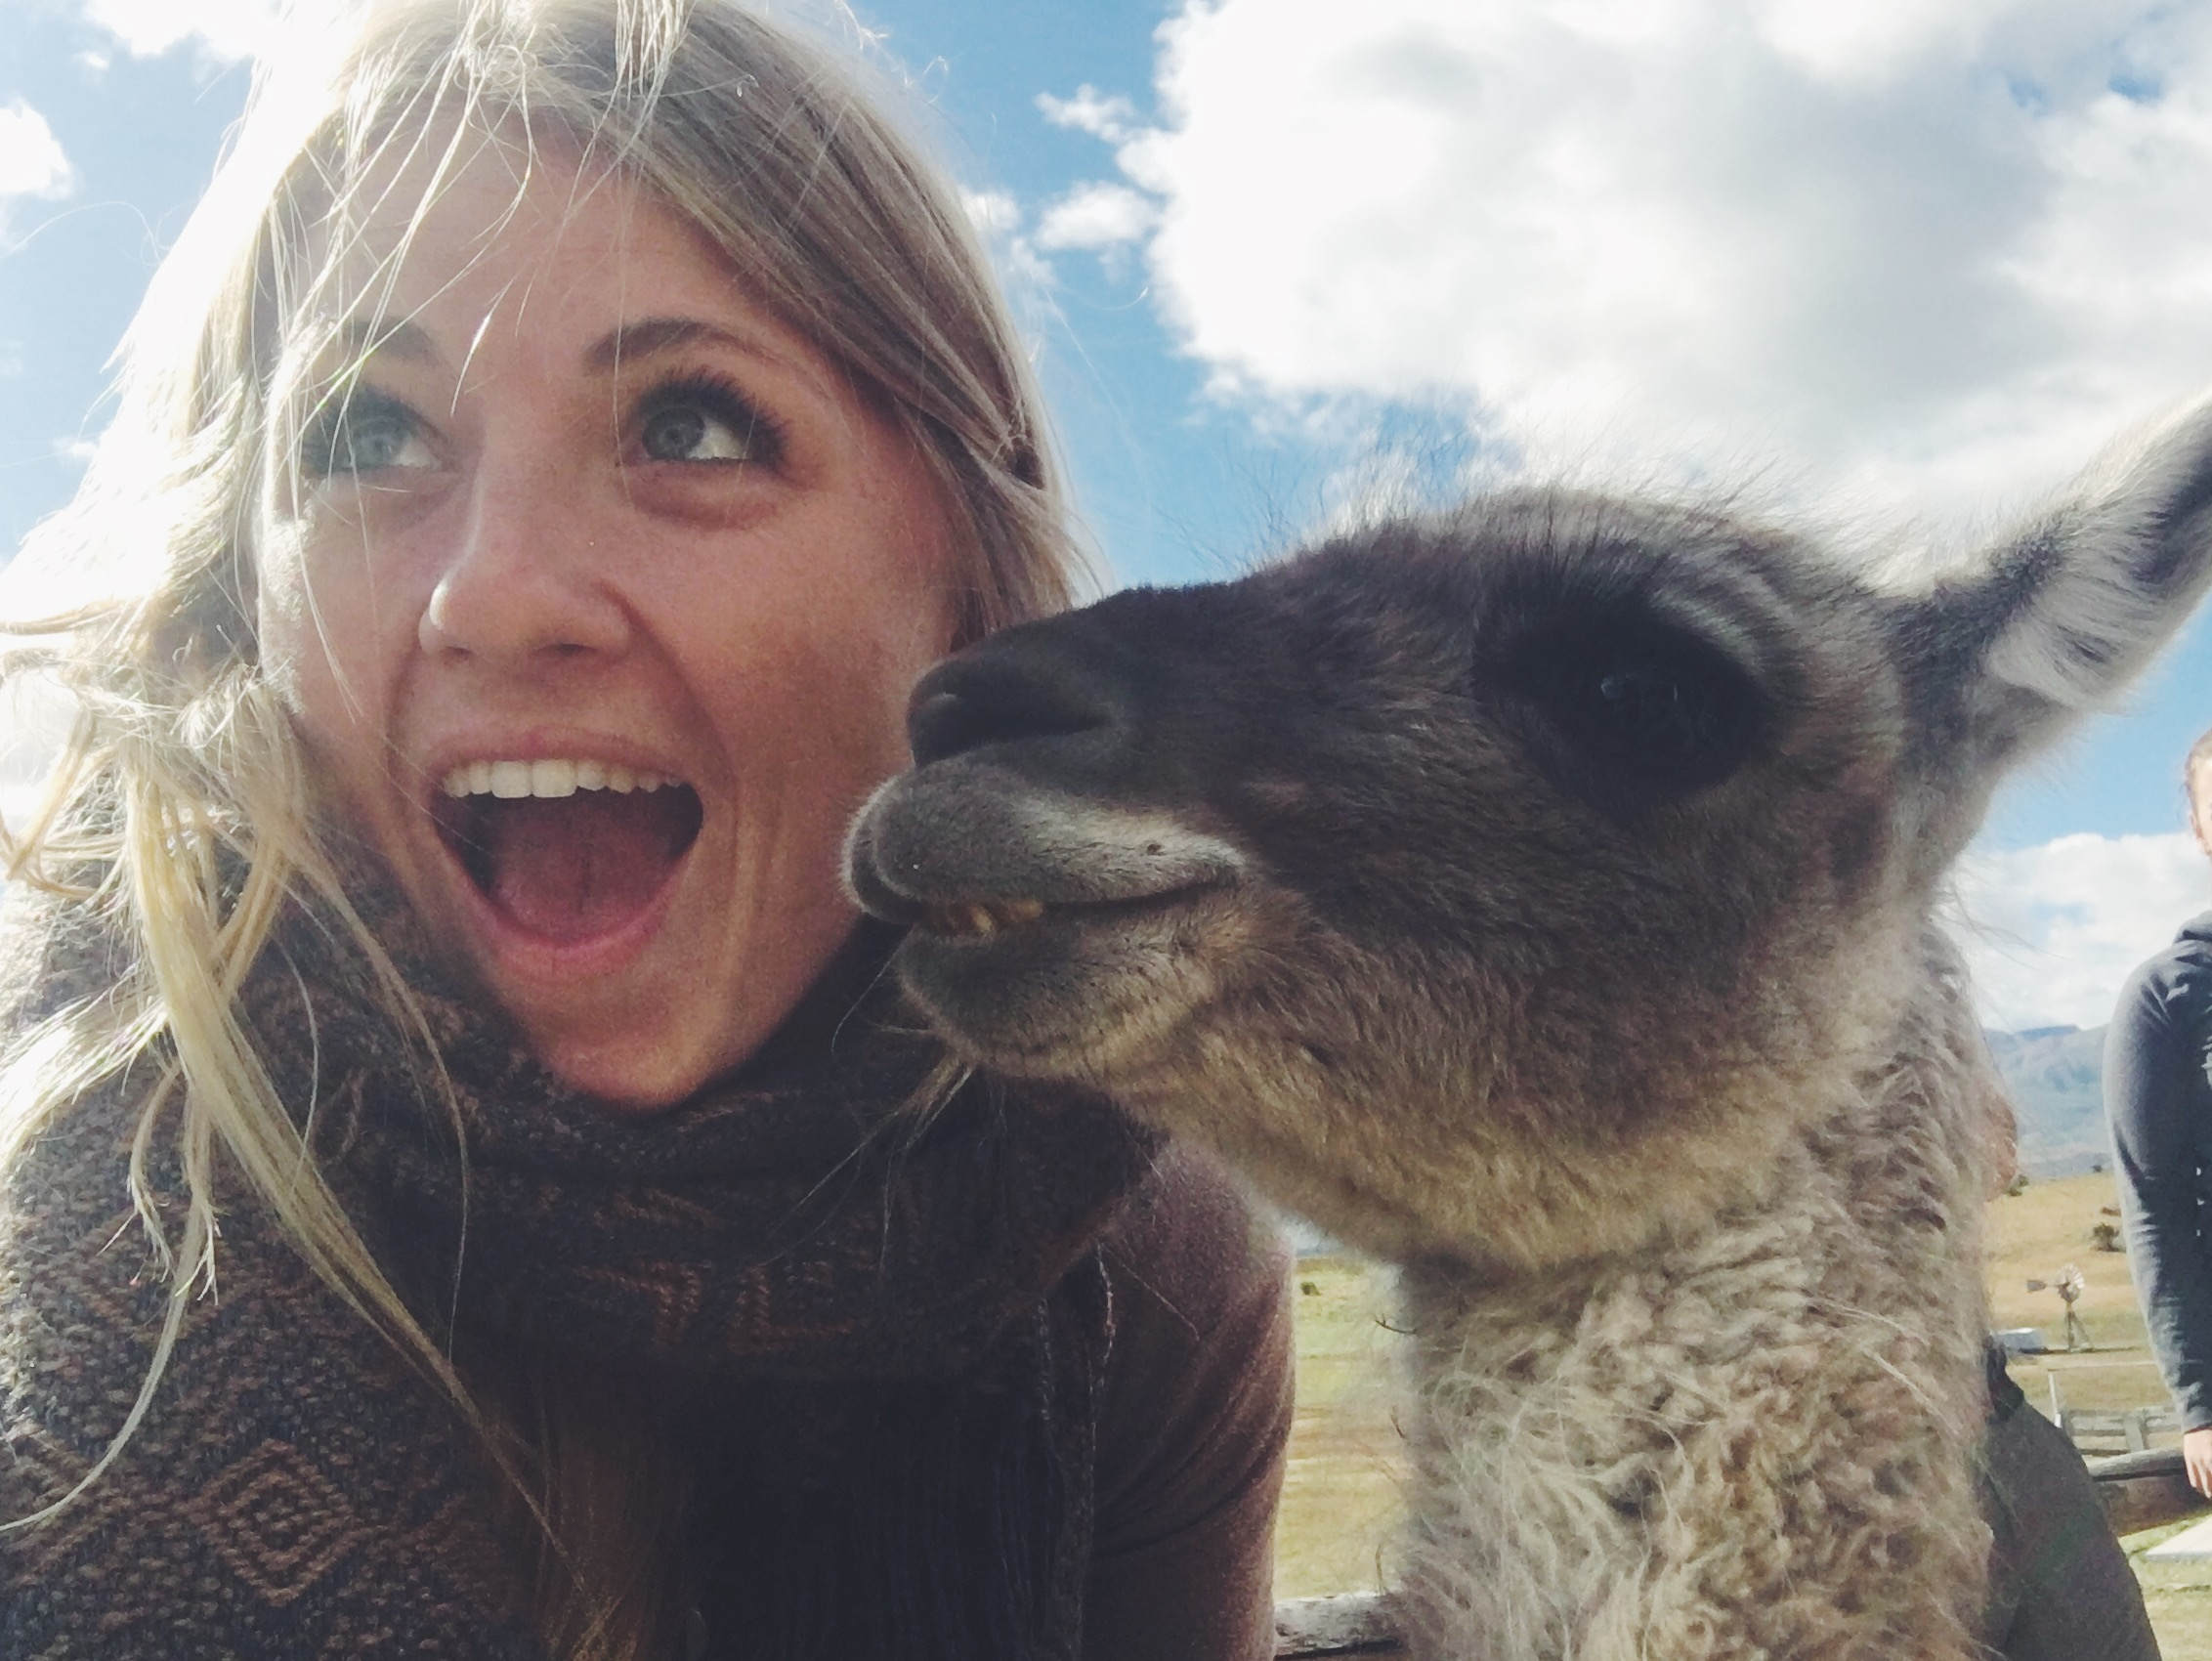 Making furry friends with llamas in Peru